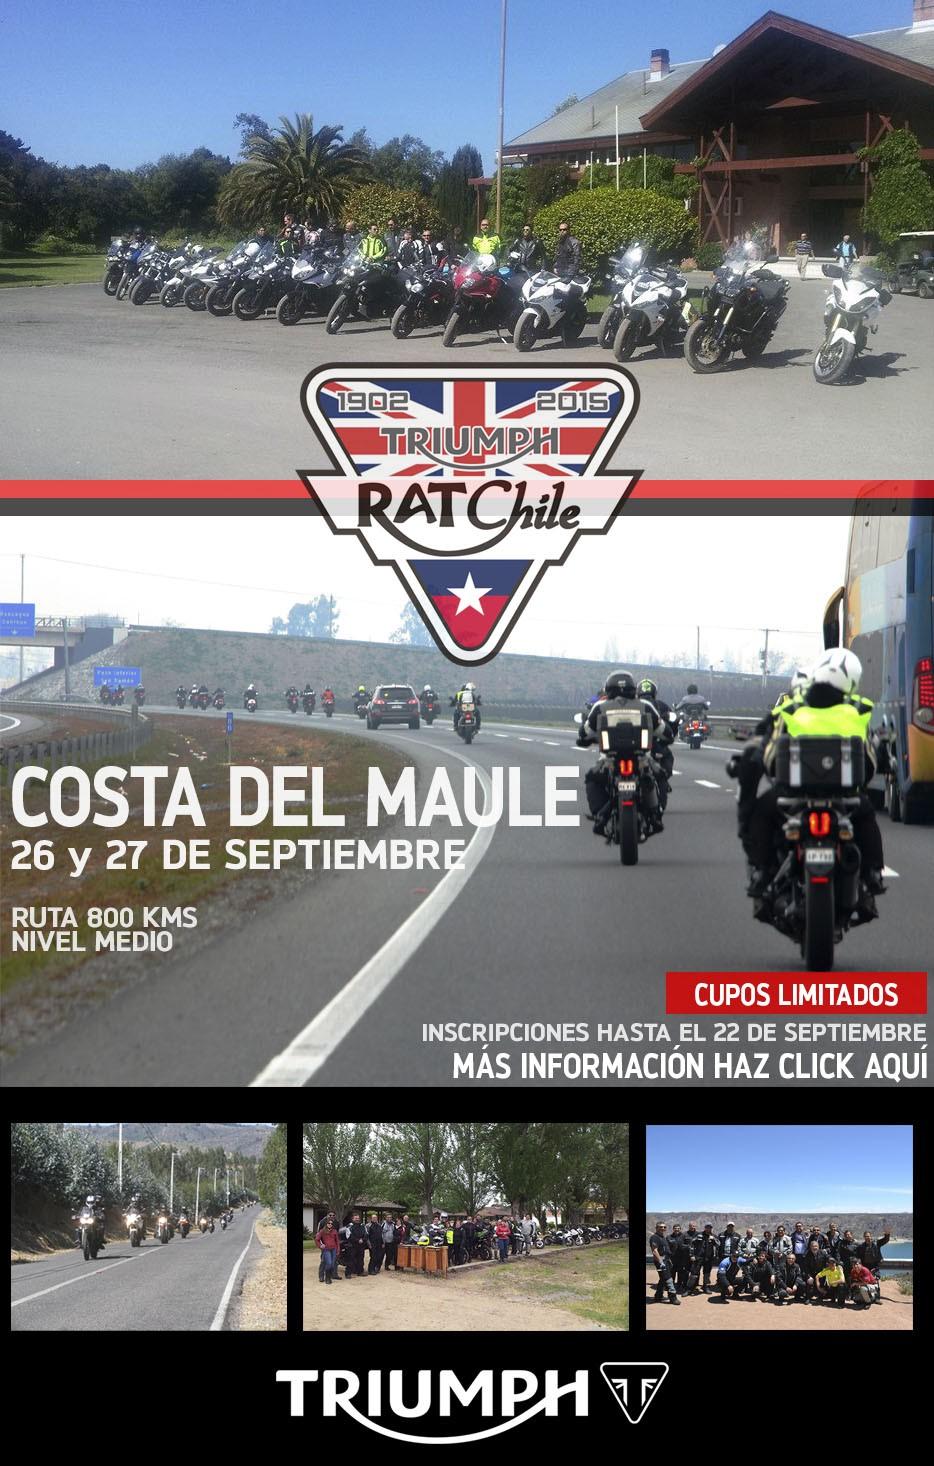 Tour Triumph RAT Costa del Maule 2015